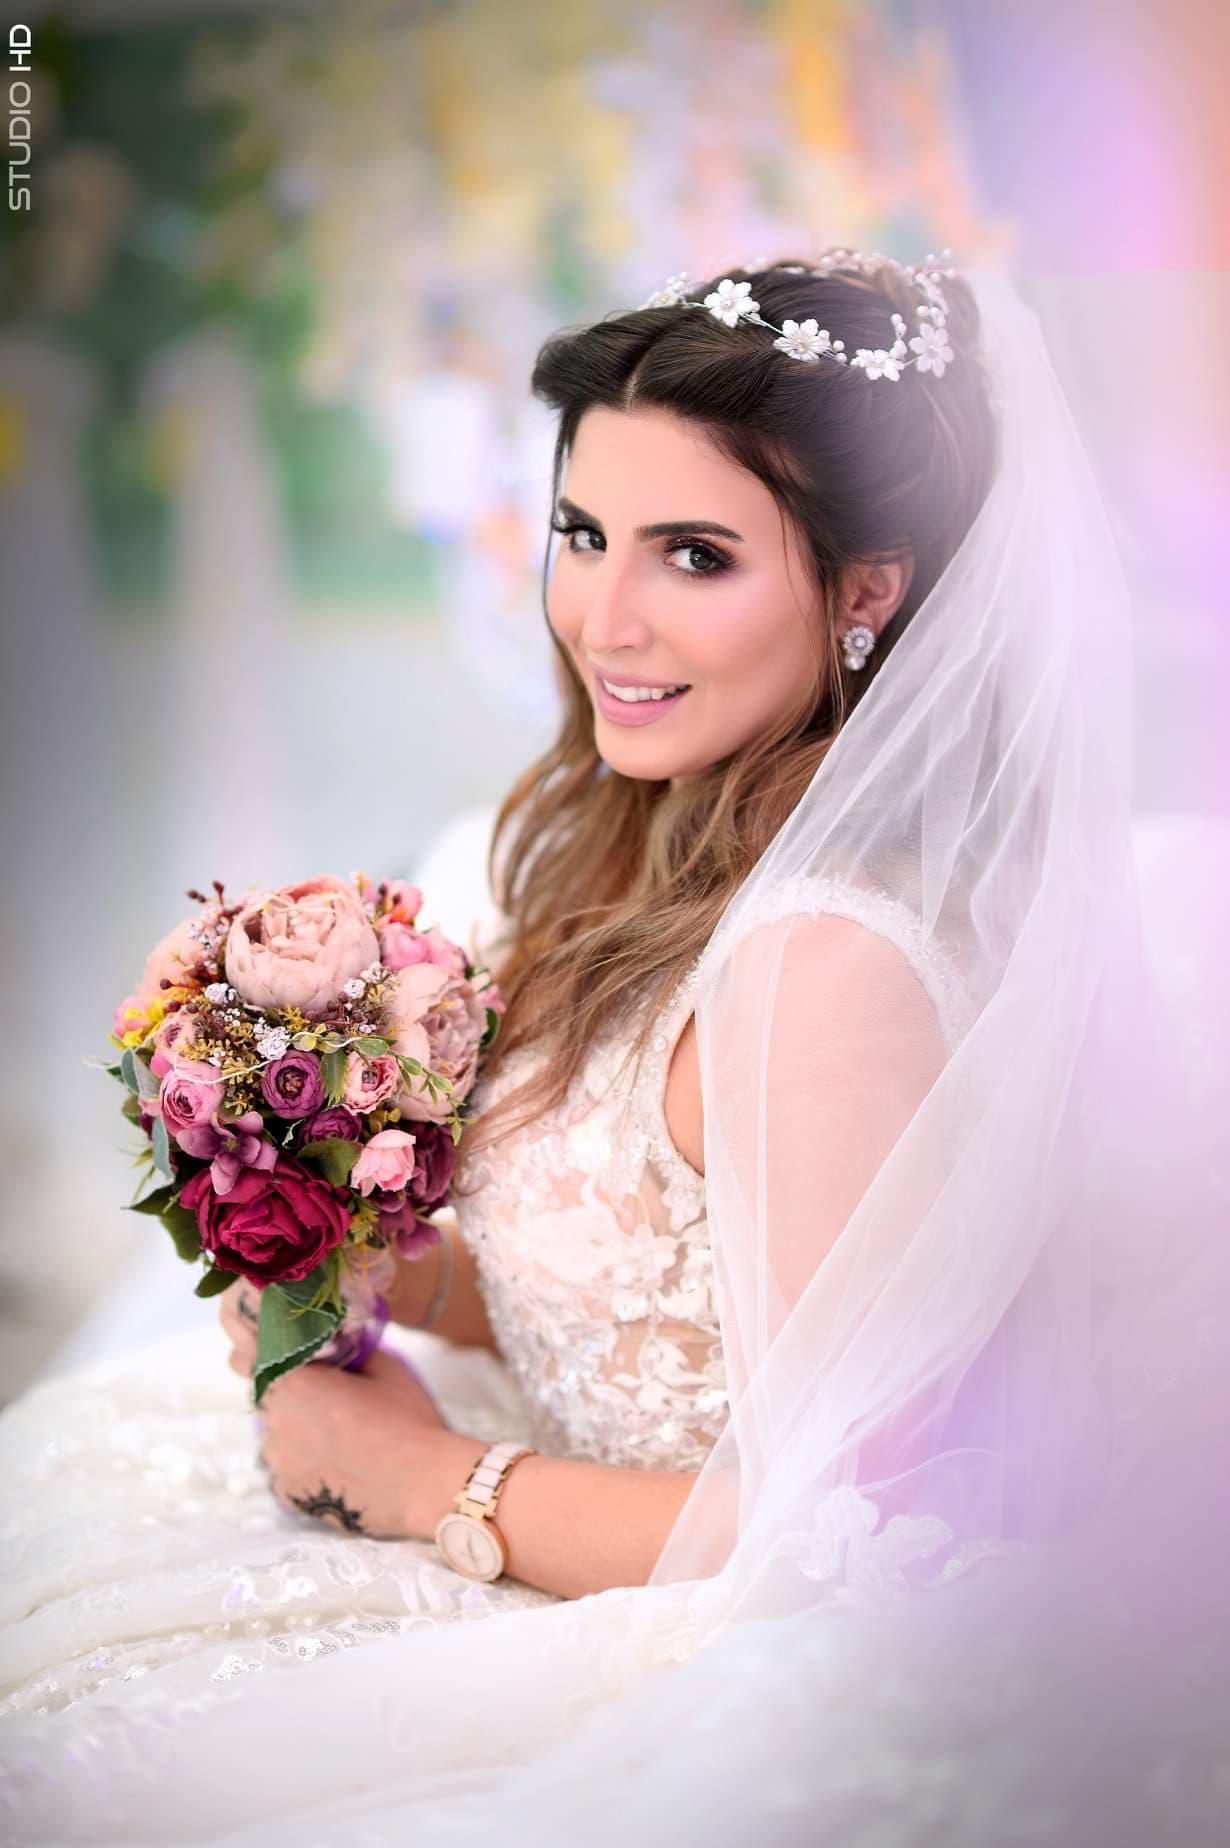 asma3_plus_belles_mariées_tunisiennes_159_2019